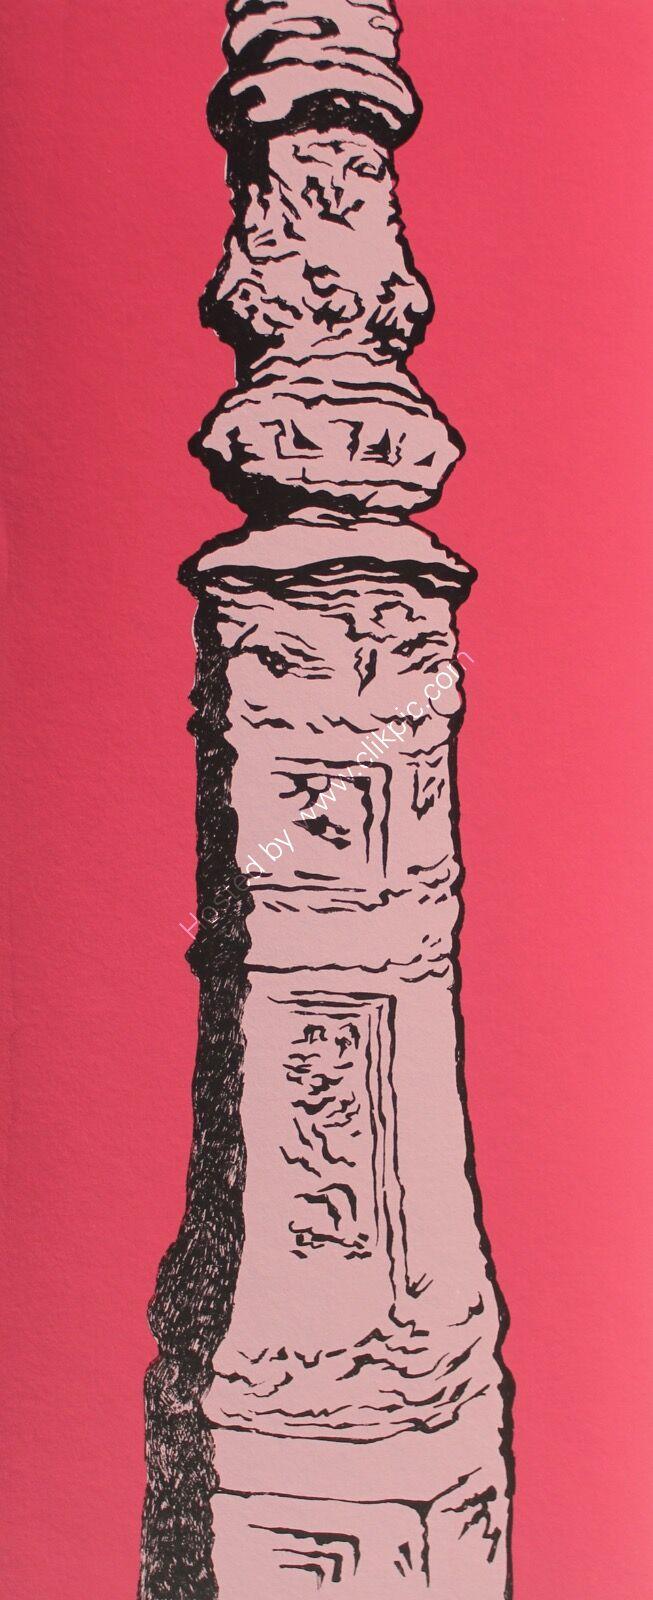 Brighton Lamppost/ Pink.